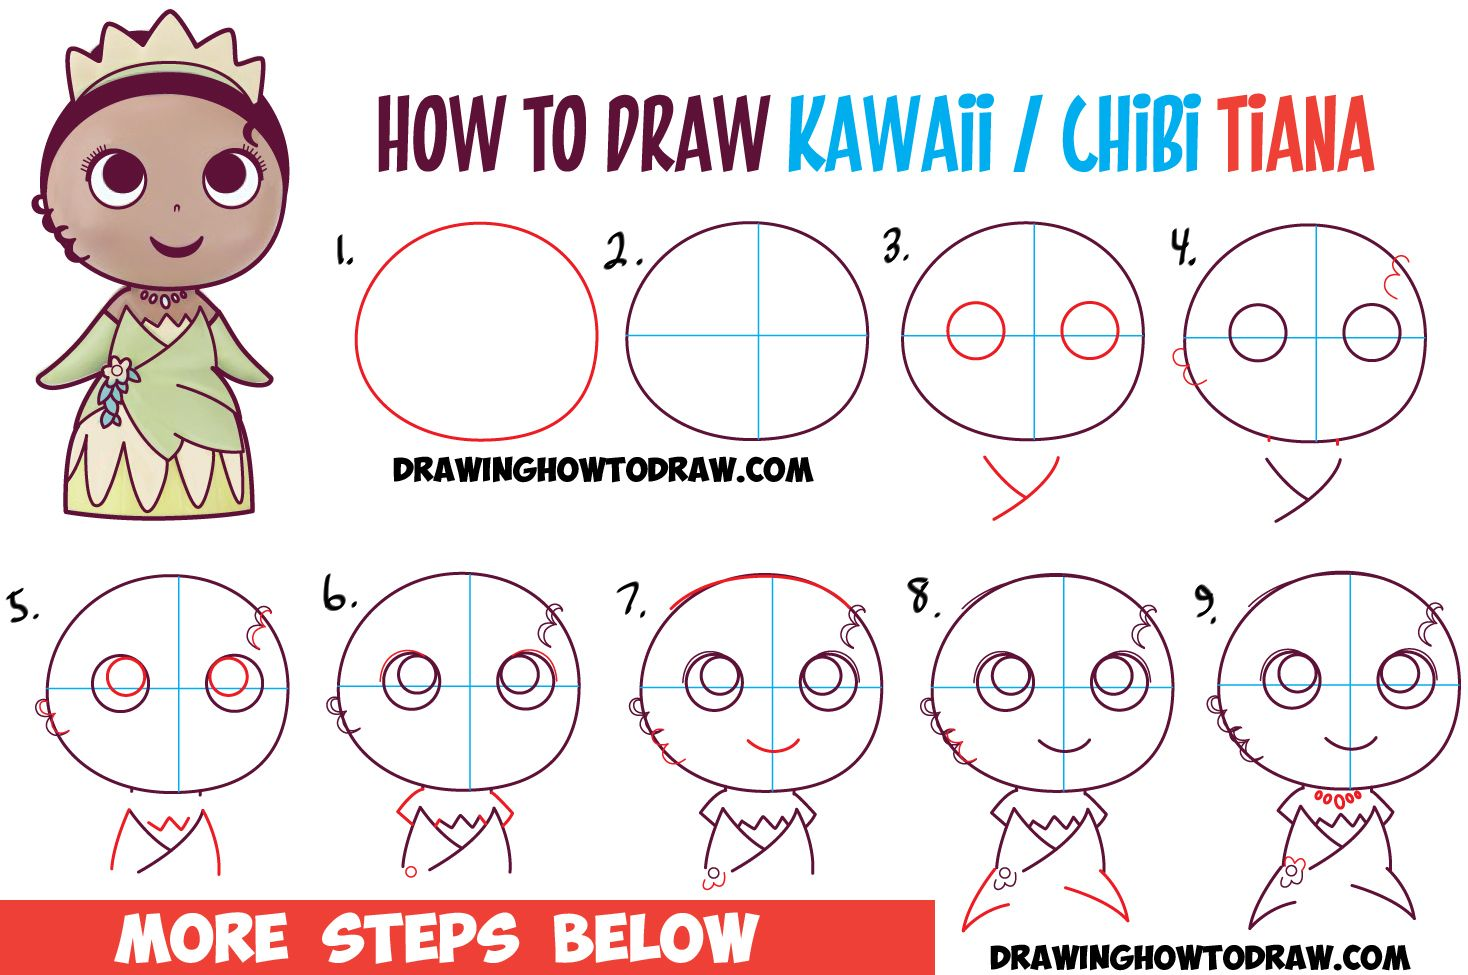 How To Draw Cute Baby Chibi Kawaii Tiana The Disney Princess How